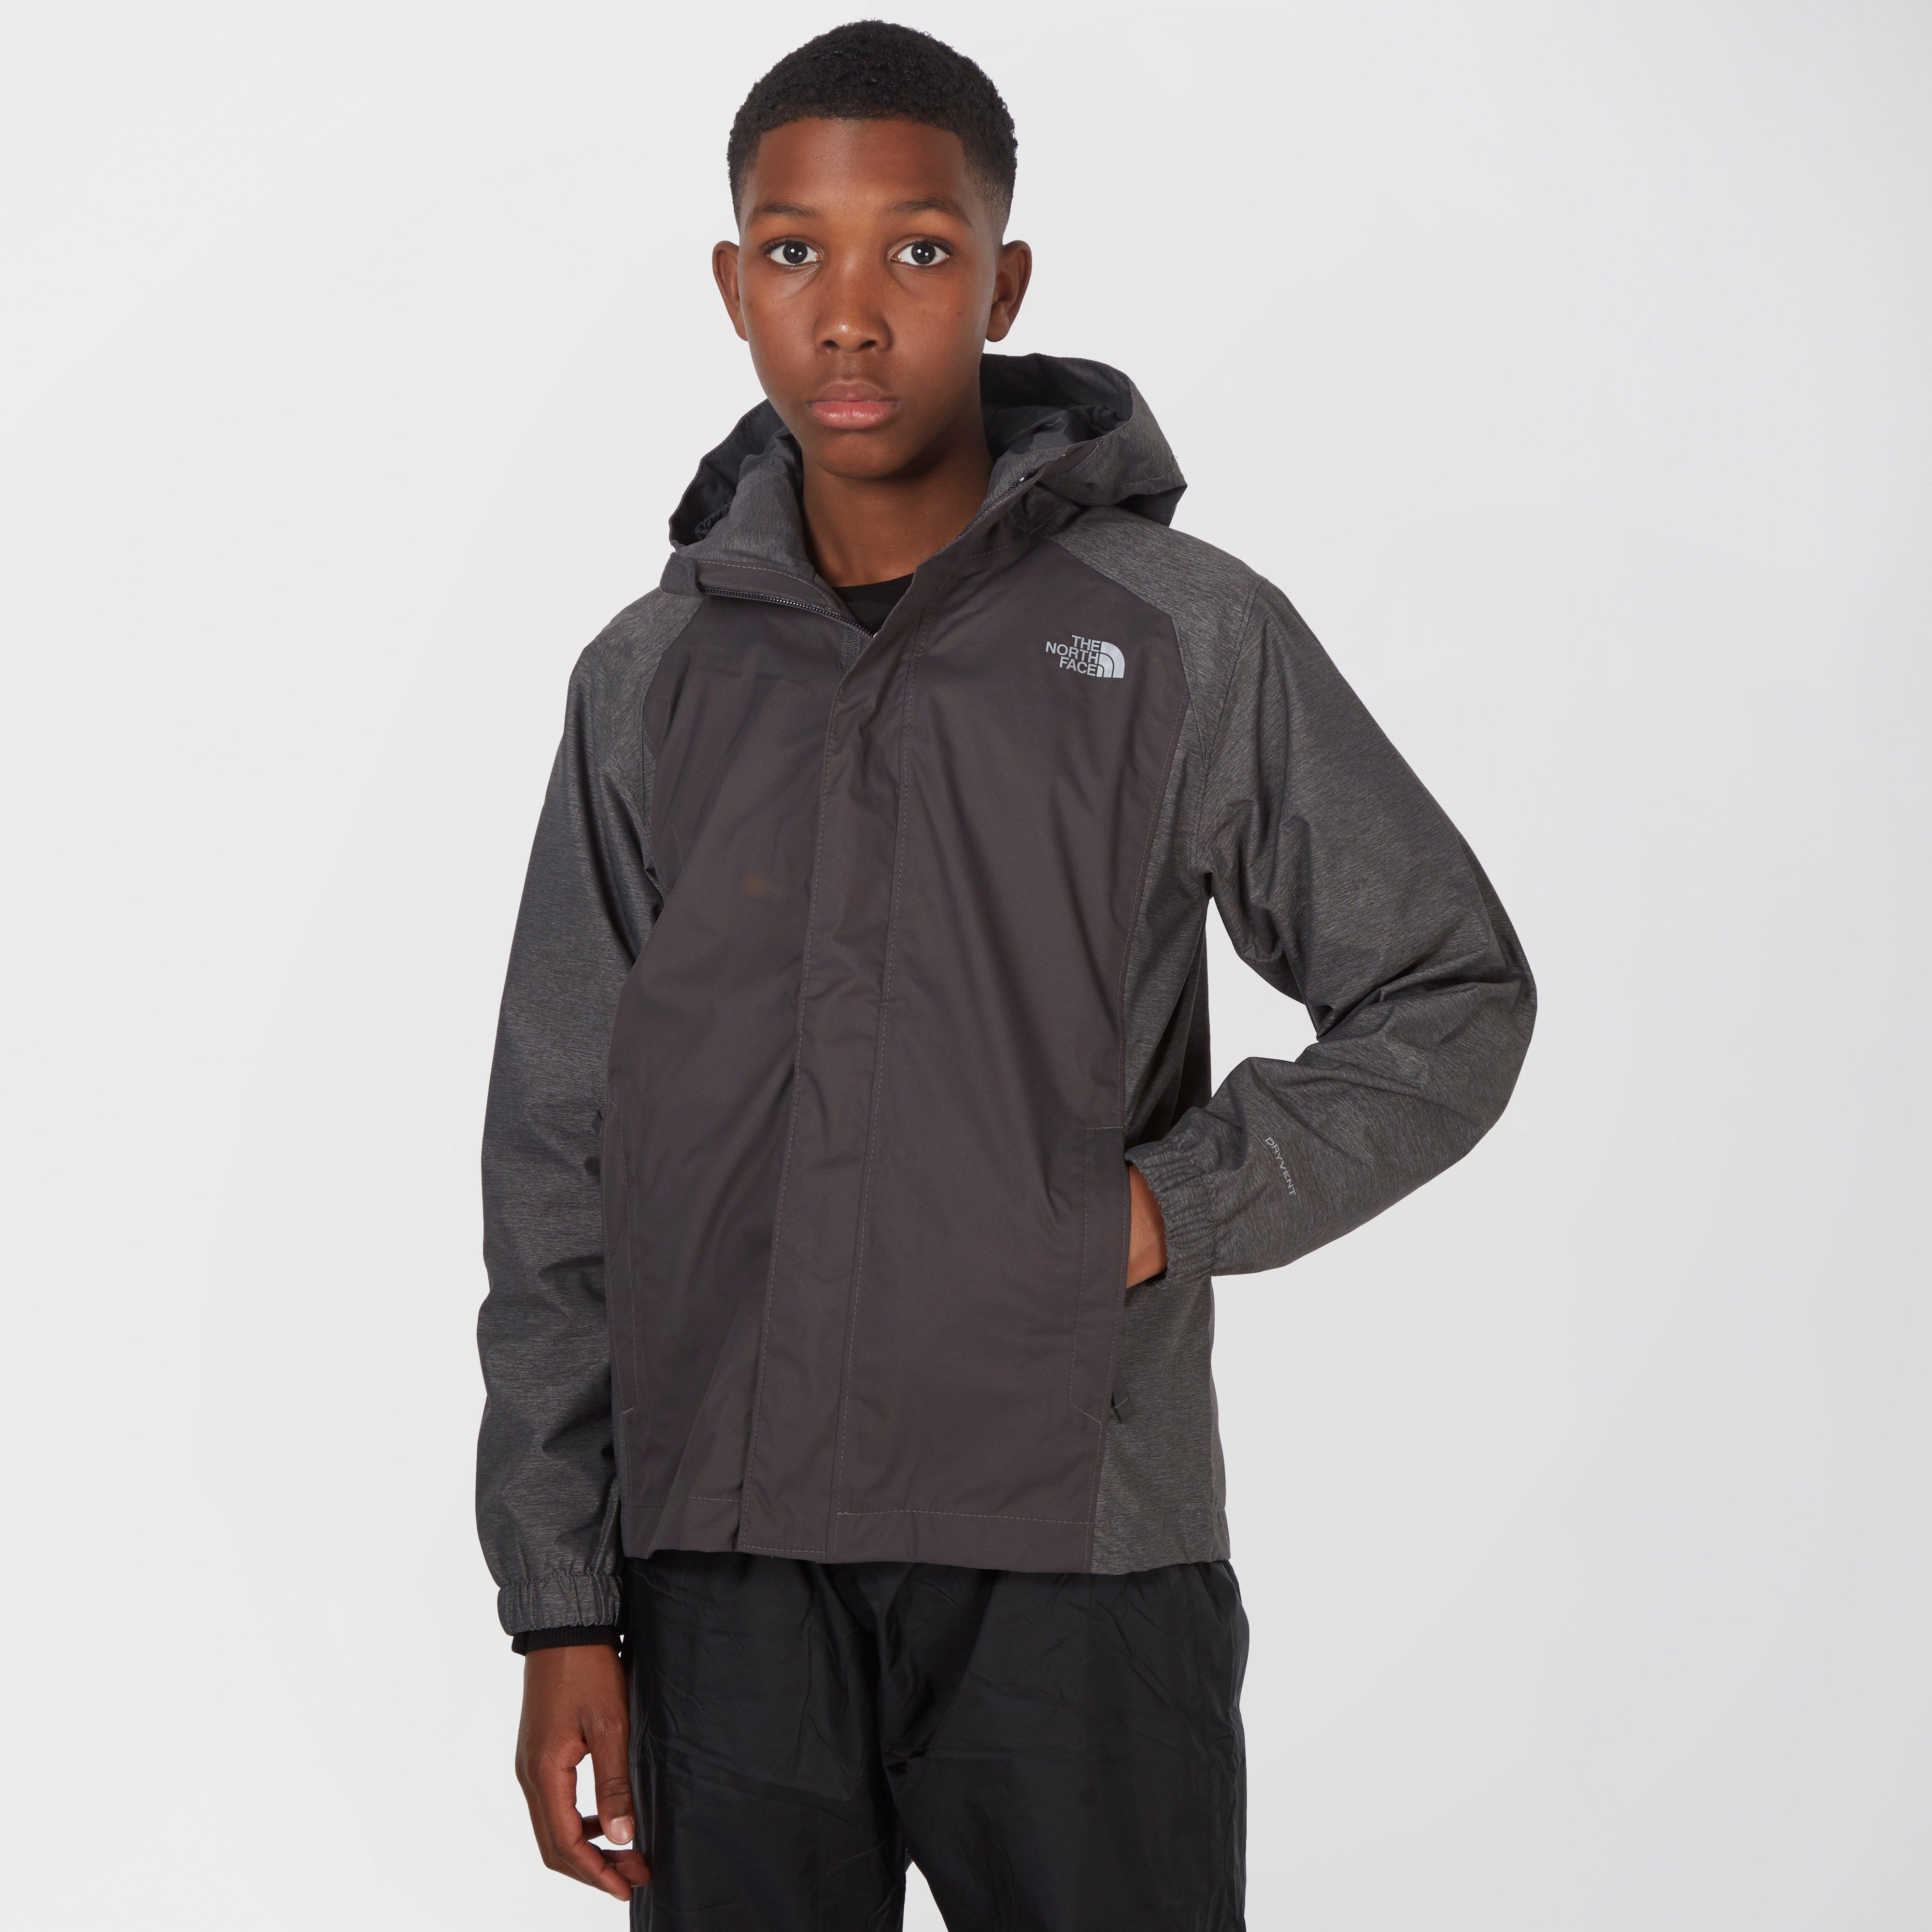 3e90cbe689 The North Face Boy's Resolve Reflective Jacket